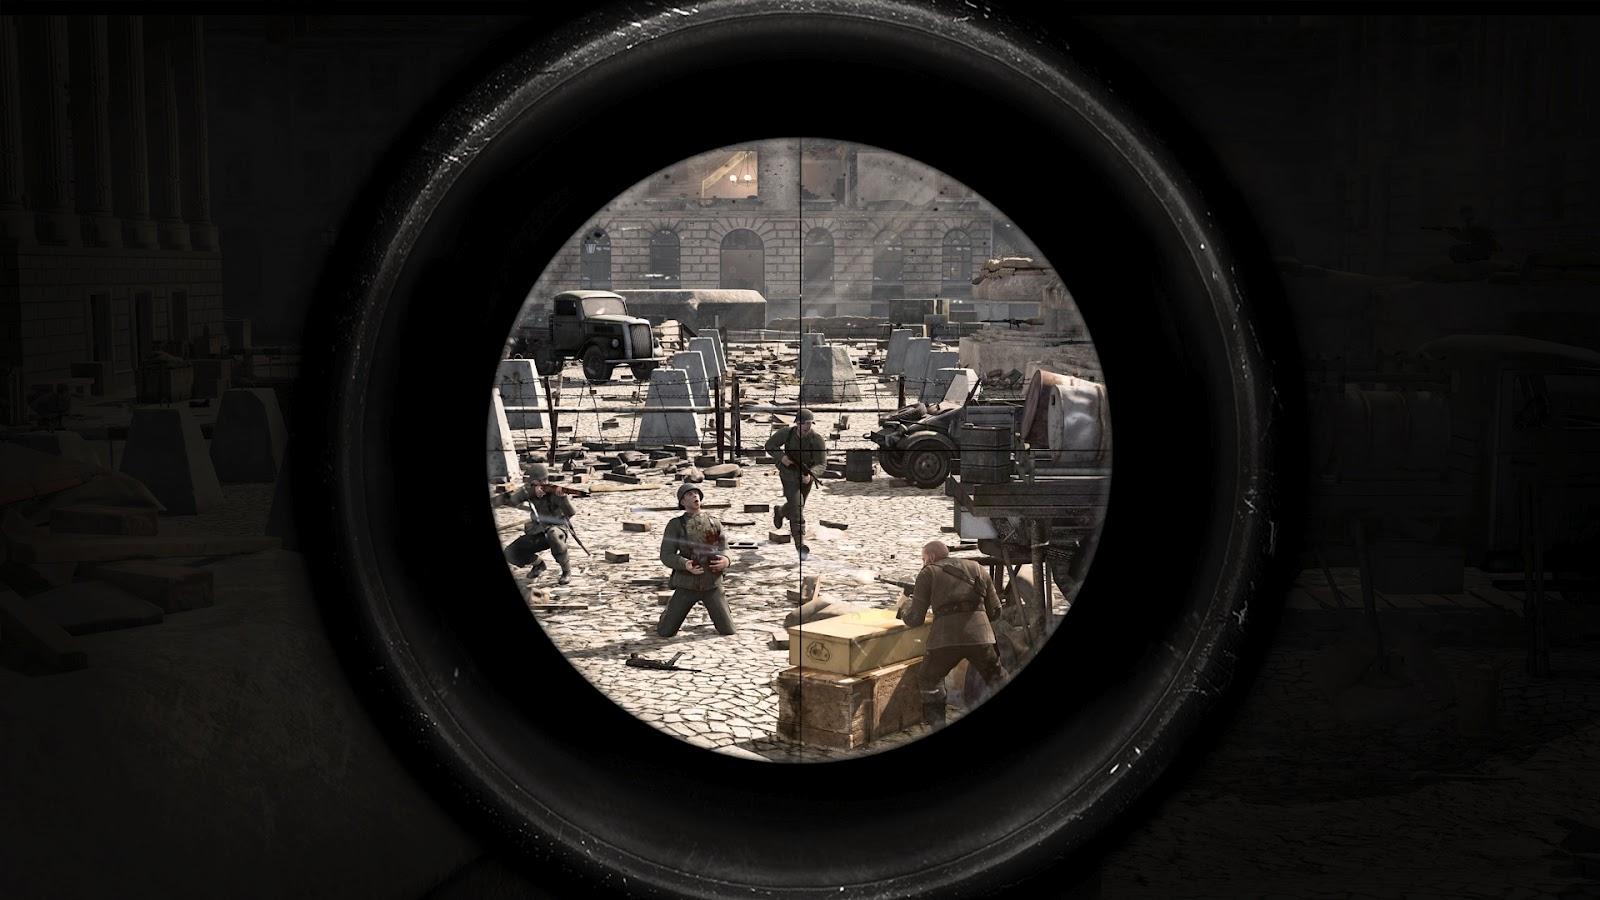 http://4.bp.blogspot.com/-GTsF0EBXIWg/UA1kM3d8mZI/AAAAAAAAArQ/FxqXMexqeT0/s1600/Sniper+Elite+V2+wallpapers.jpg